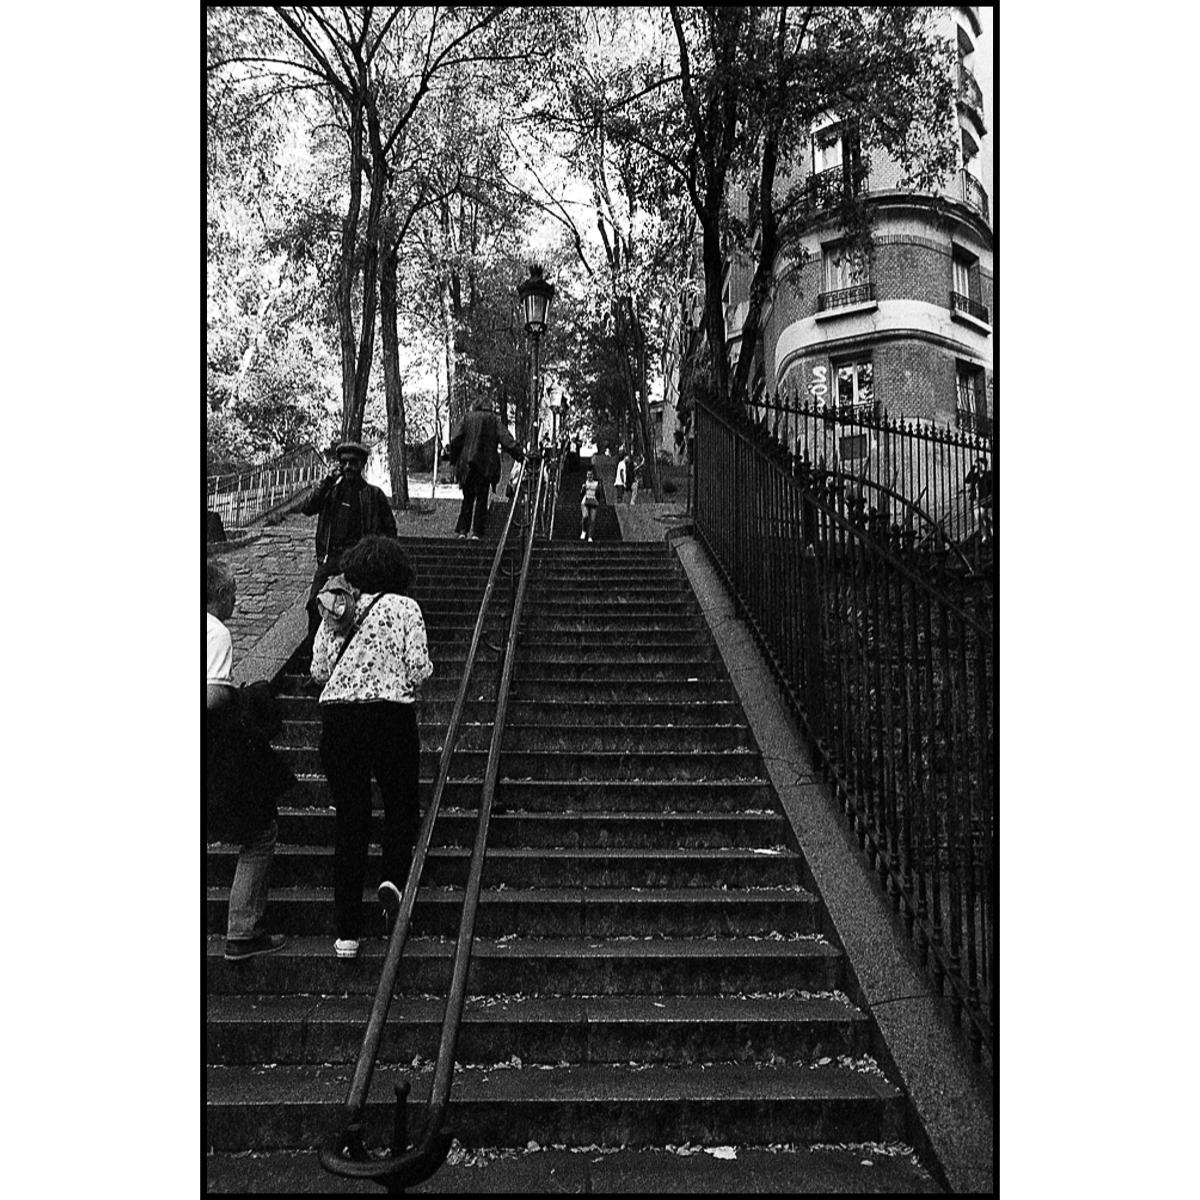 paris file-021.jpg